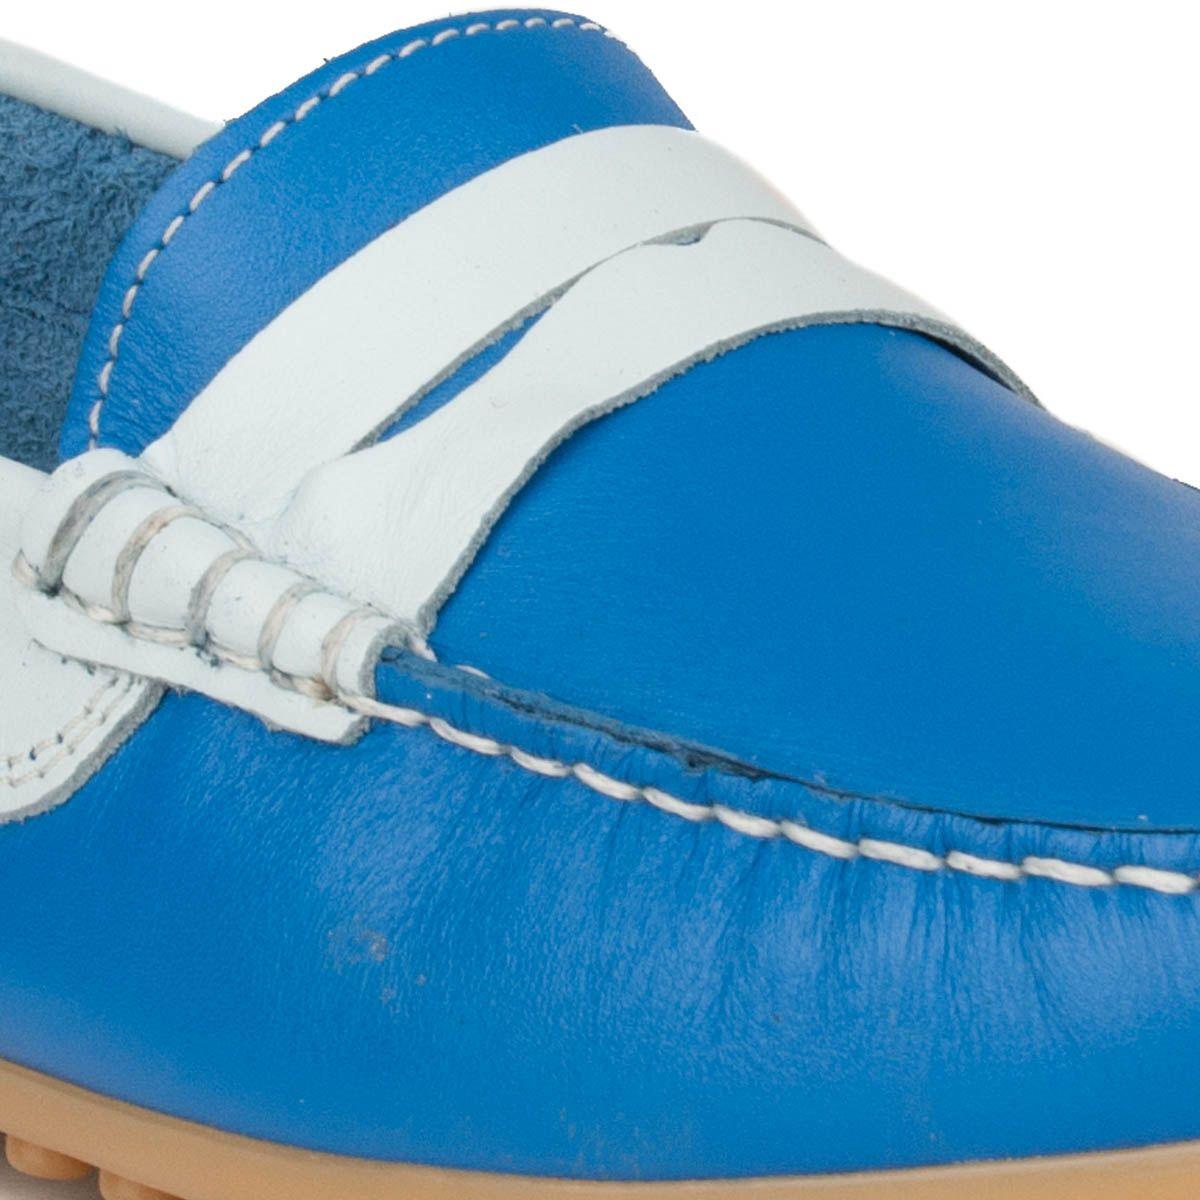 Montevita Comfortable Moccasin in Blue